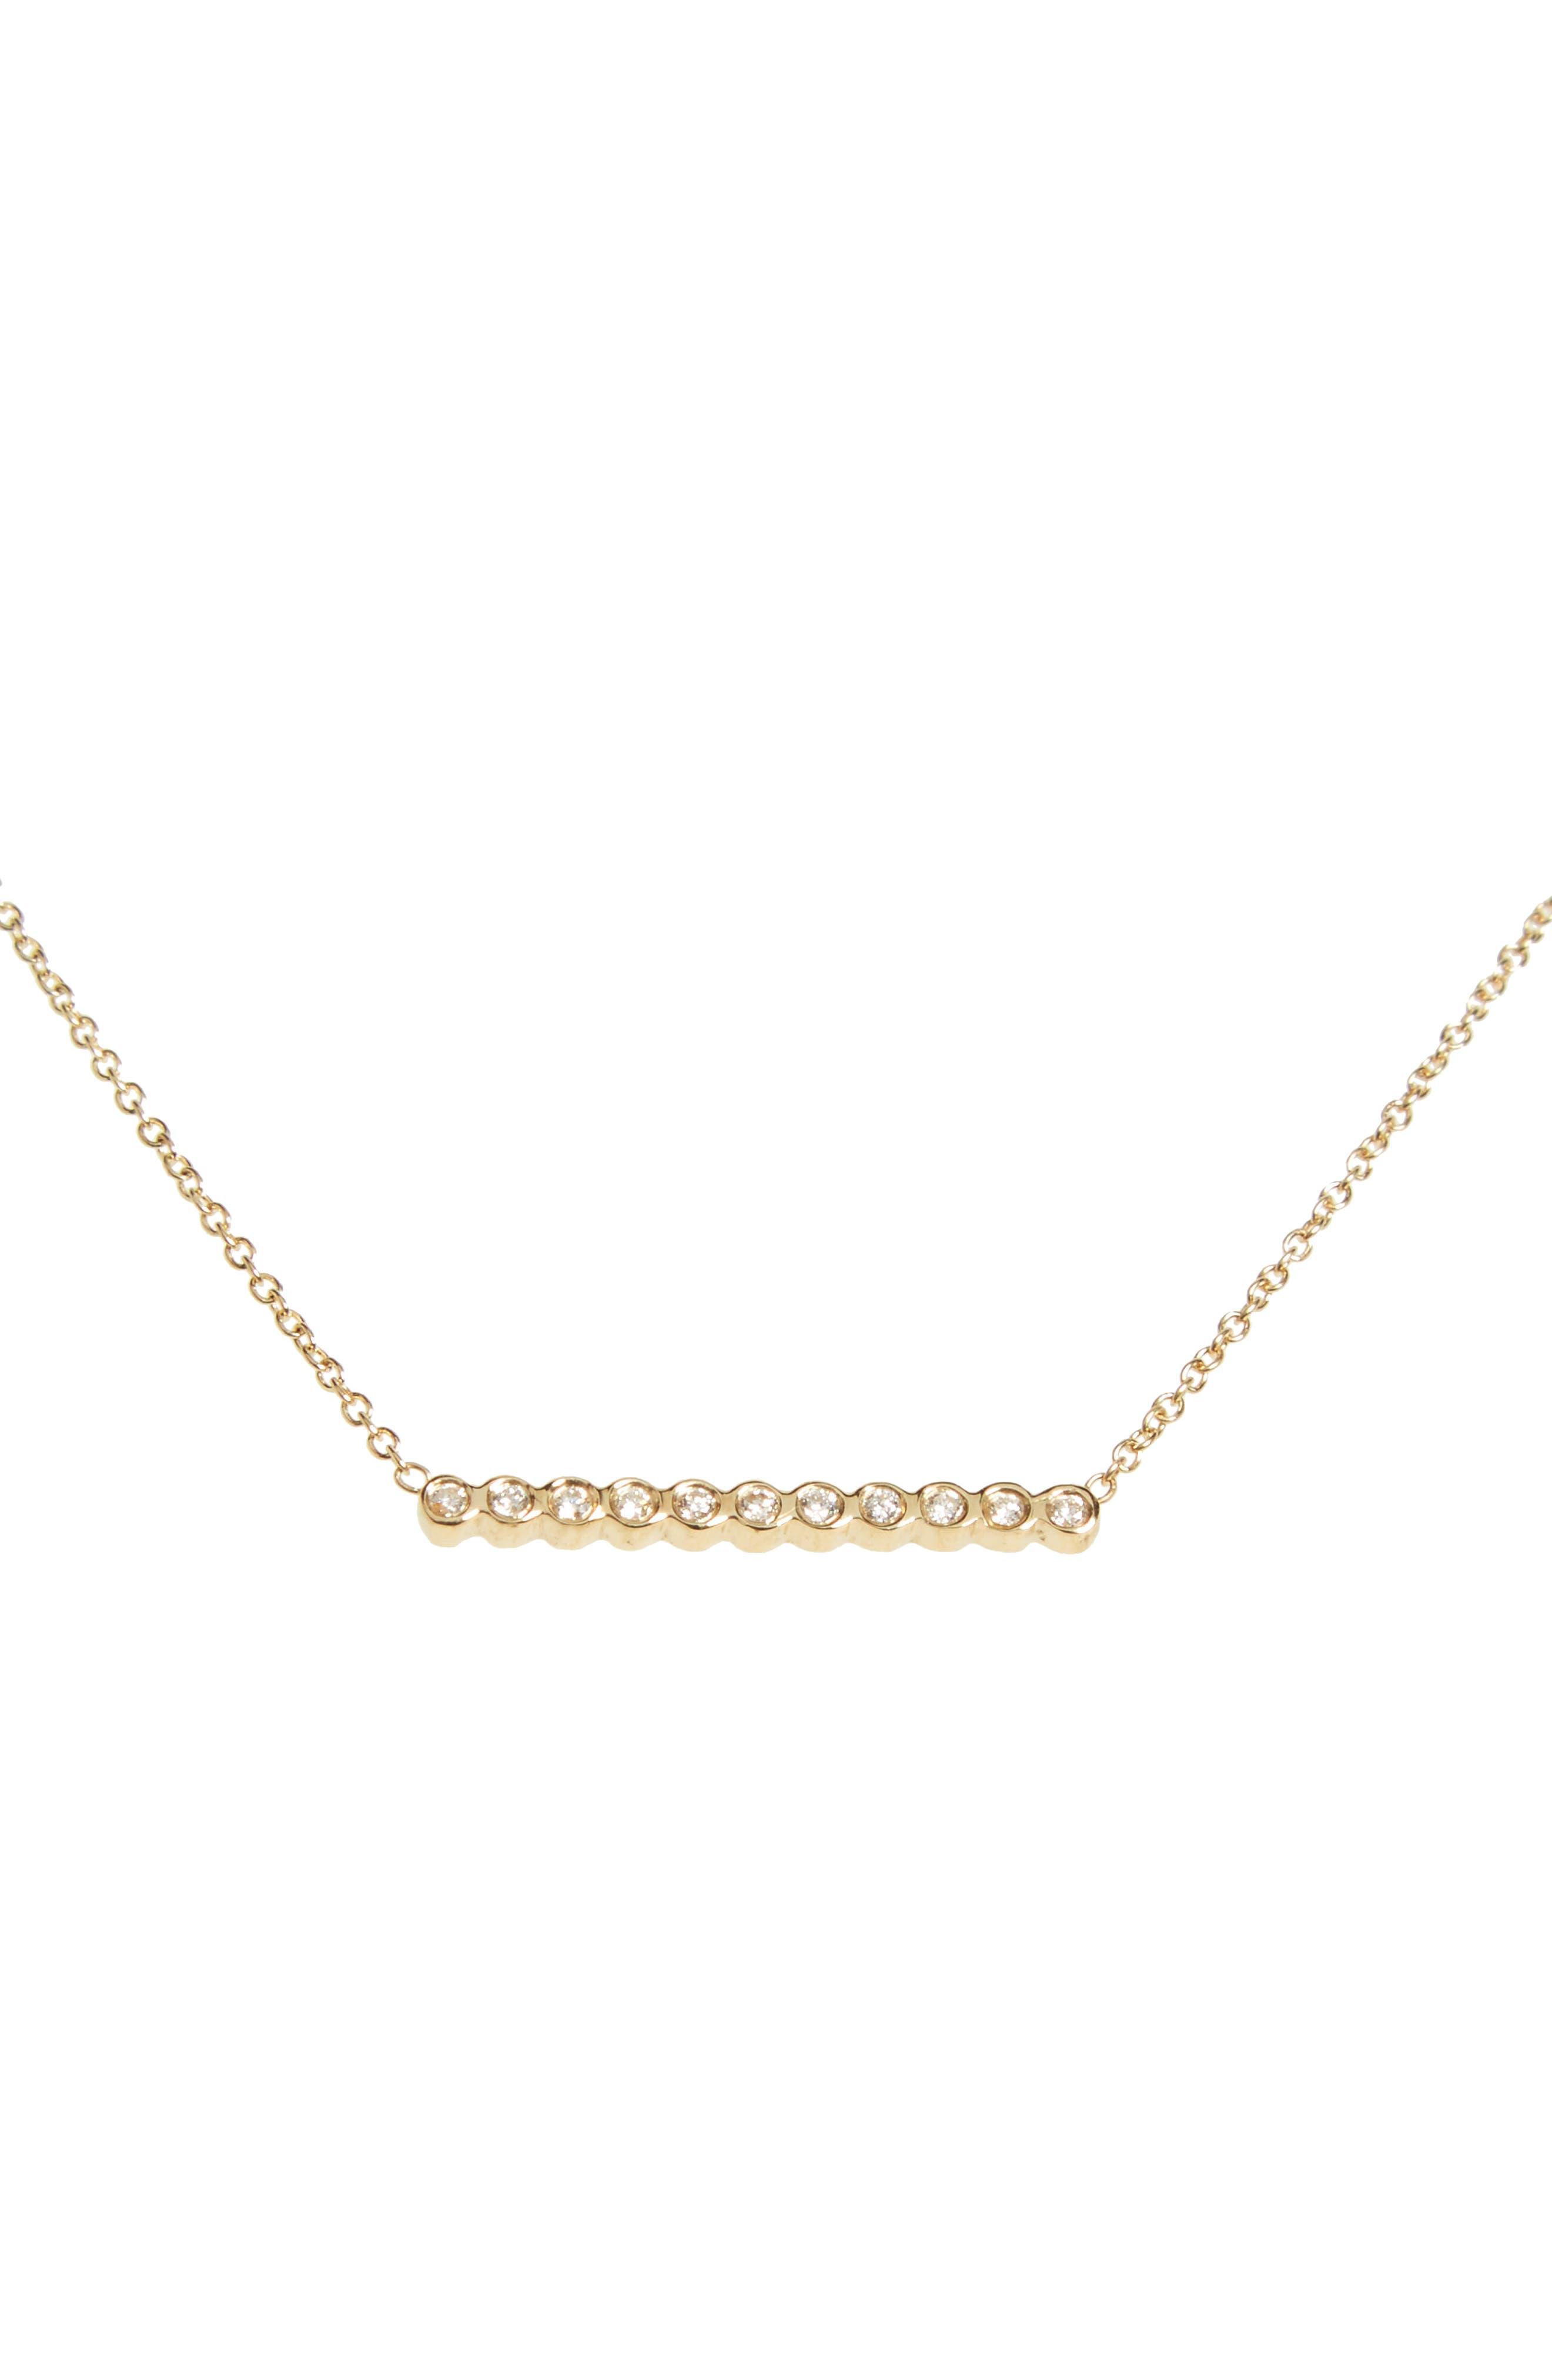 Diamond Bar Pendant Necklace,                             Alternate thumbnail 2, color,                             YELLOW GOLD